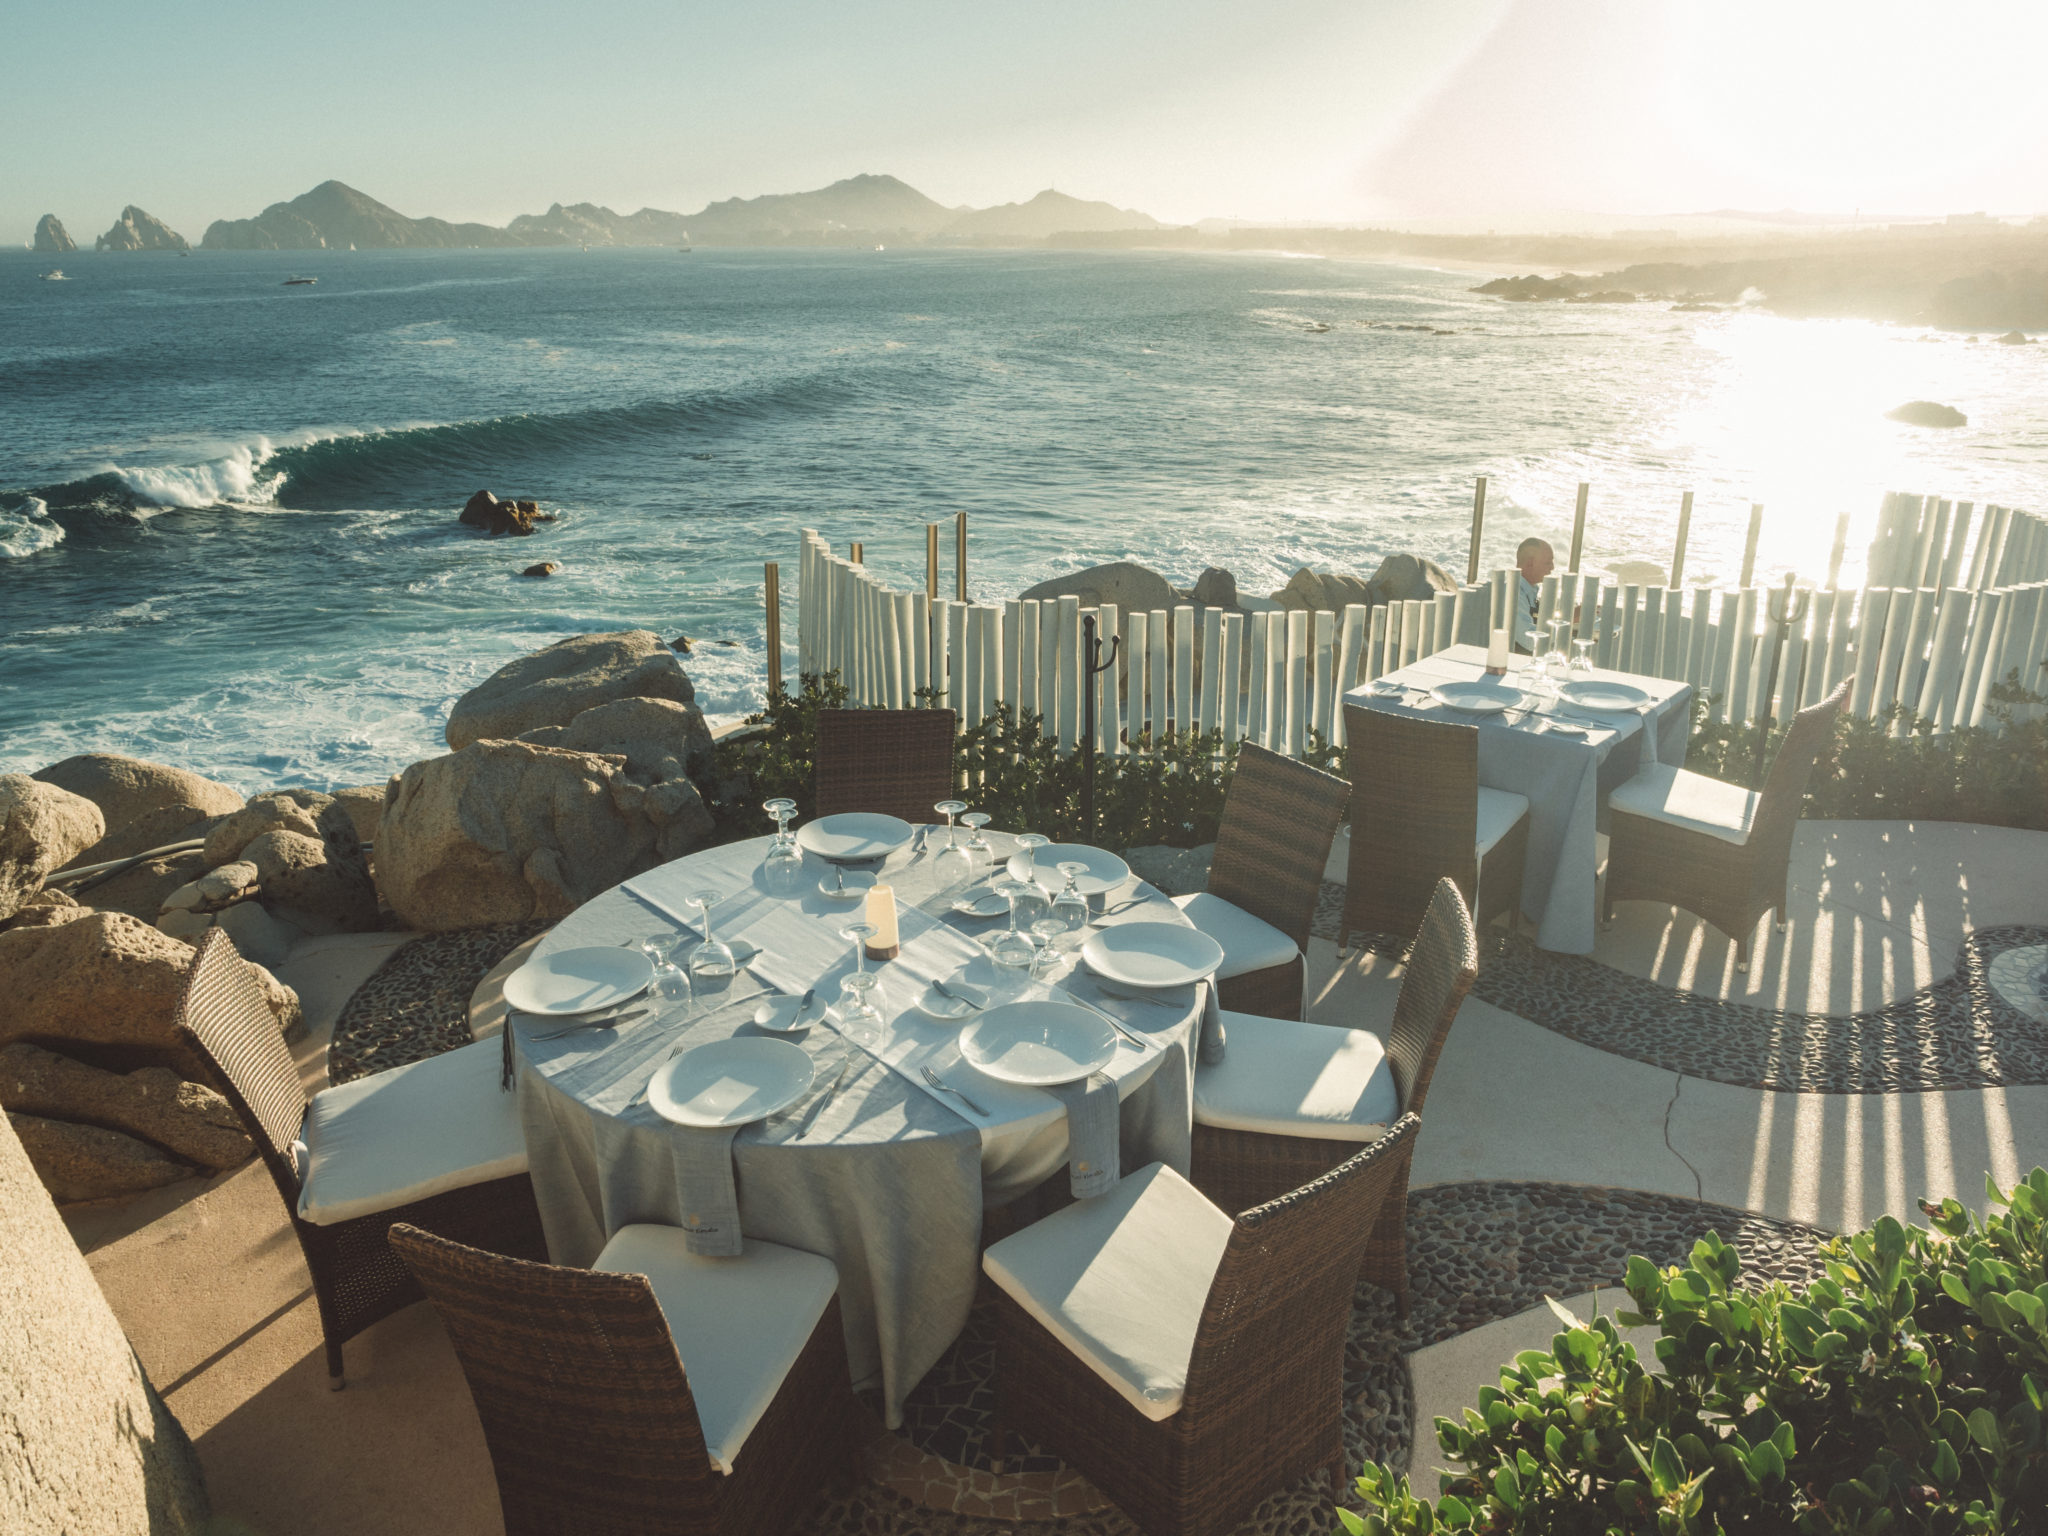 Cabo San Lucas | WORLD OF WANDERLUST